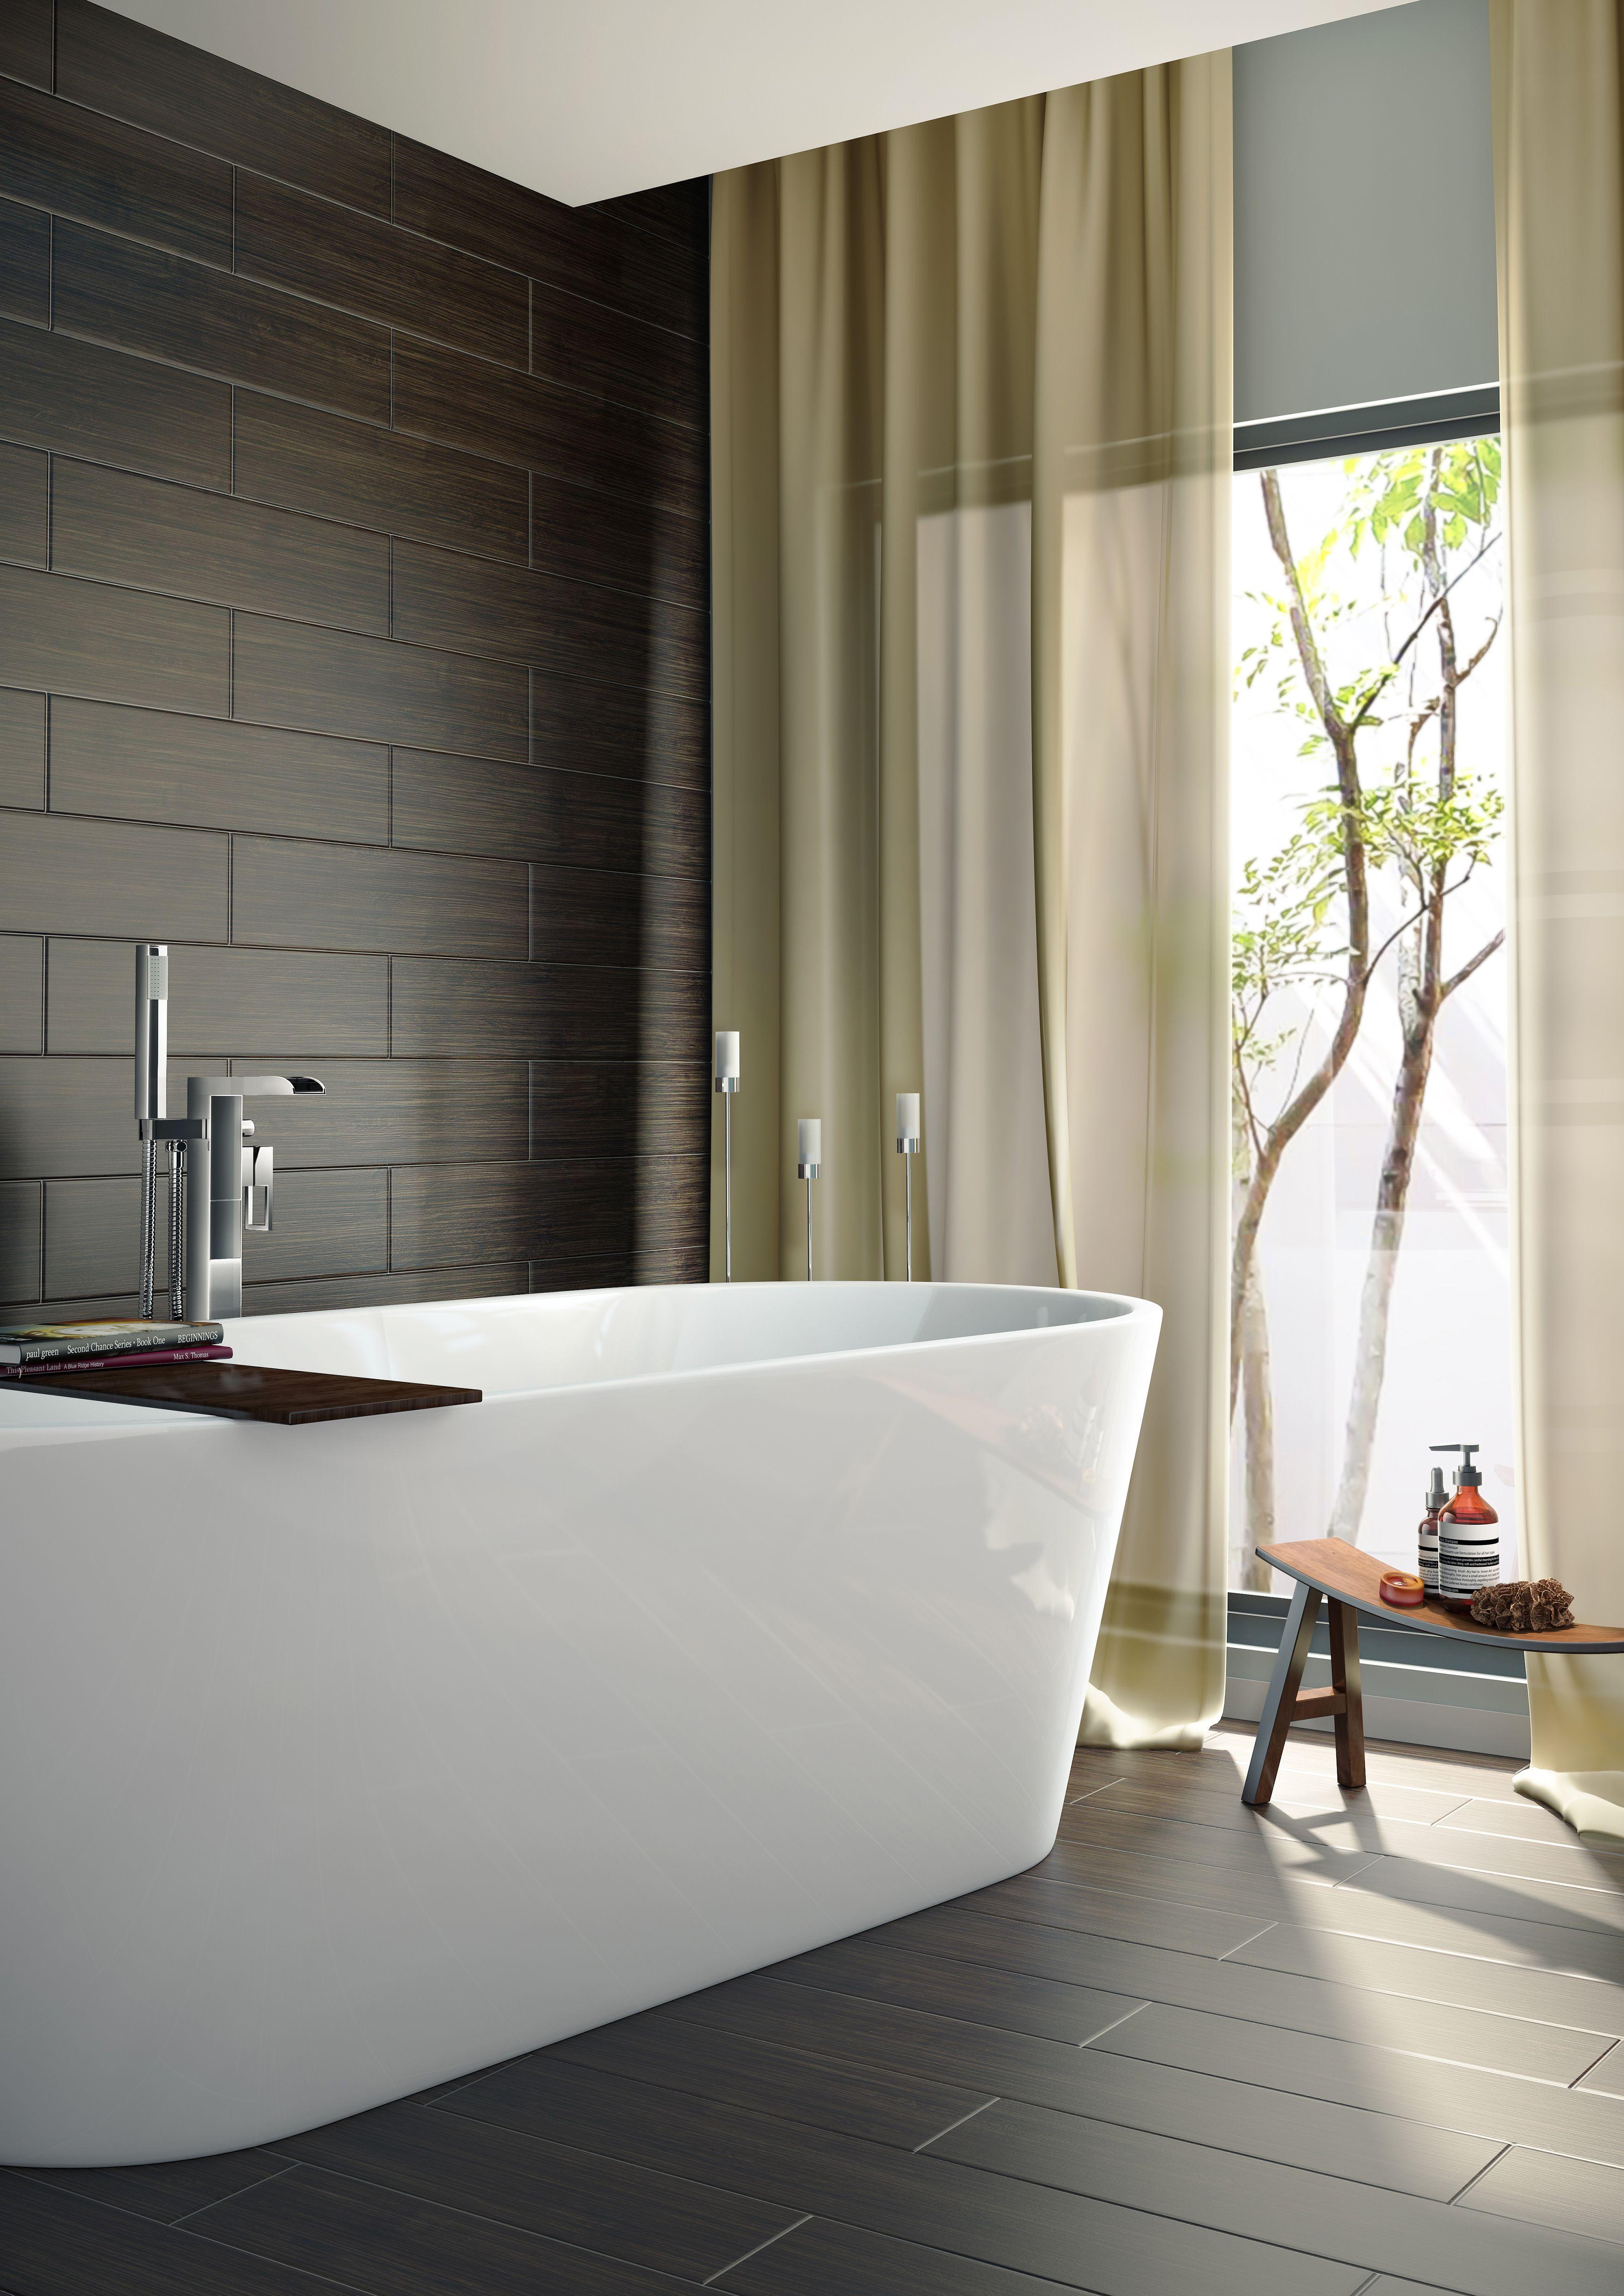 Tadelakt bathroom made by amel kadic - Bath